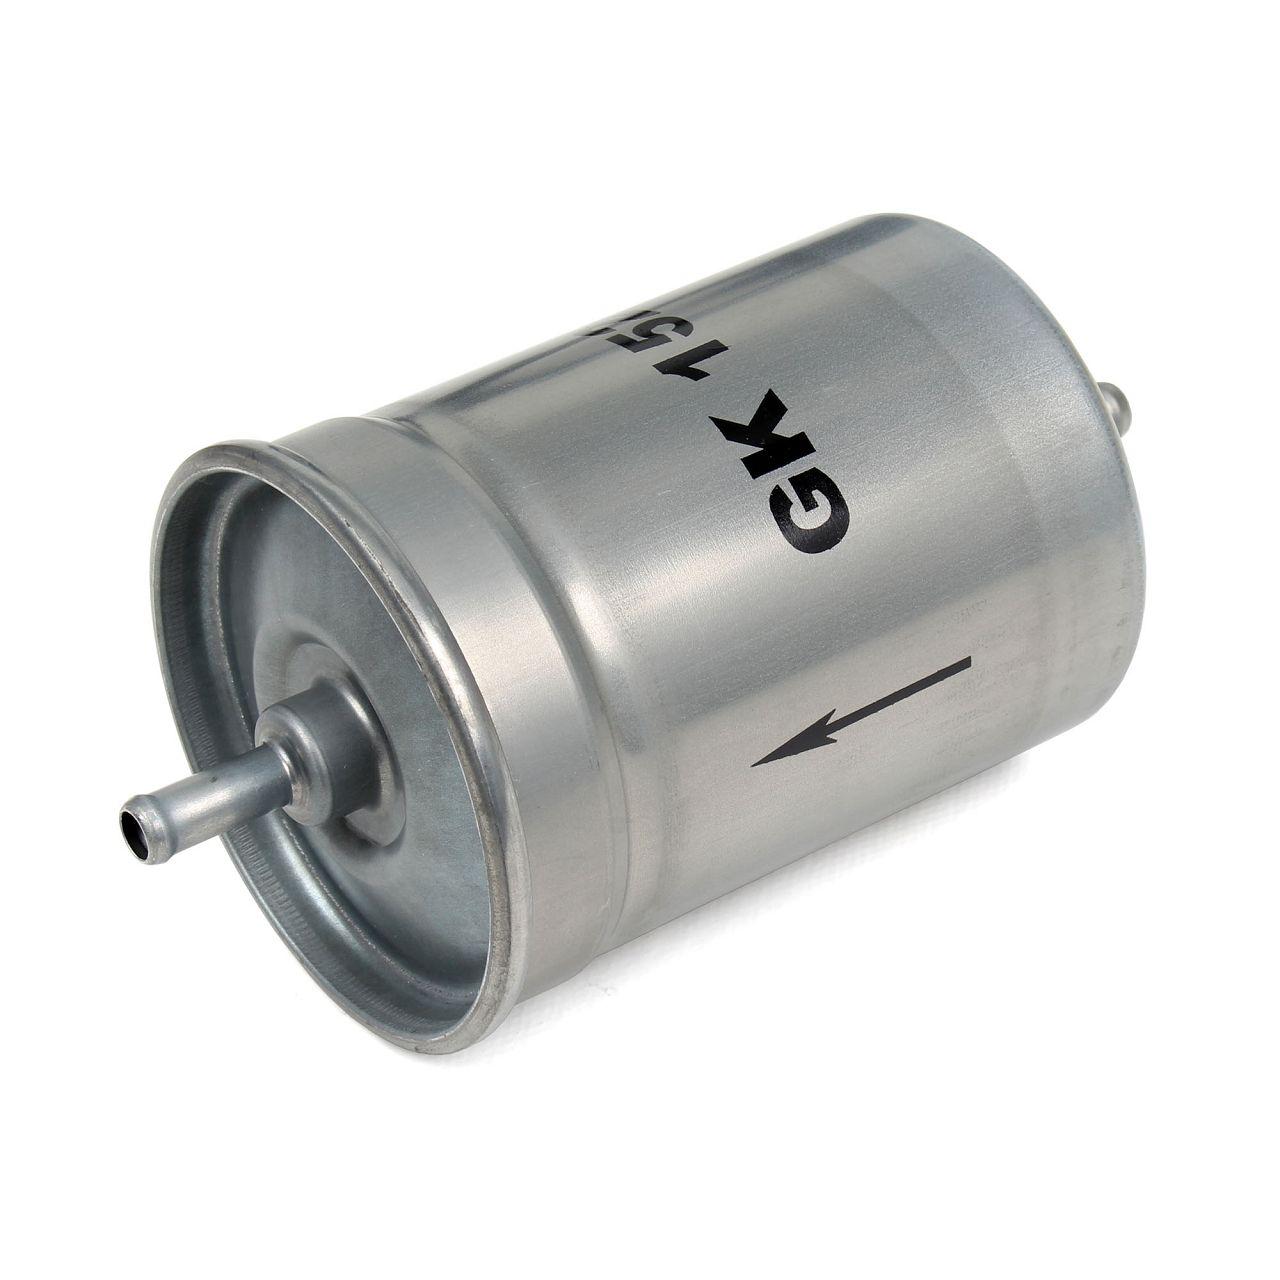 Filterpaket Filterset für Audi A6 (4B C5) 2.4 2.7T 2.8 3.0 136-250 PS